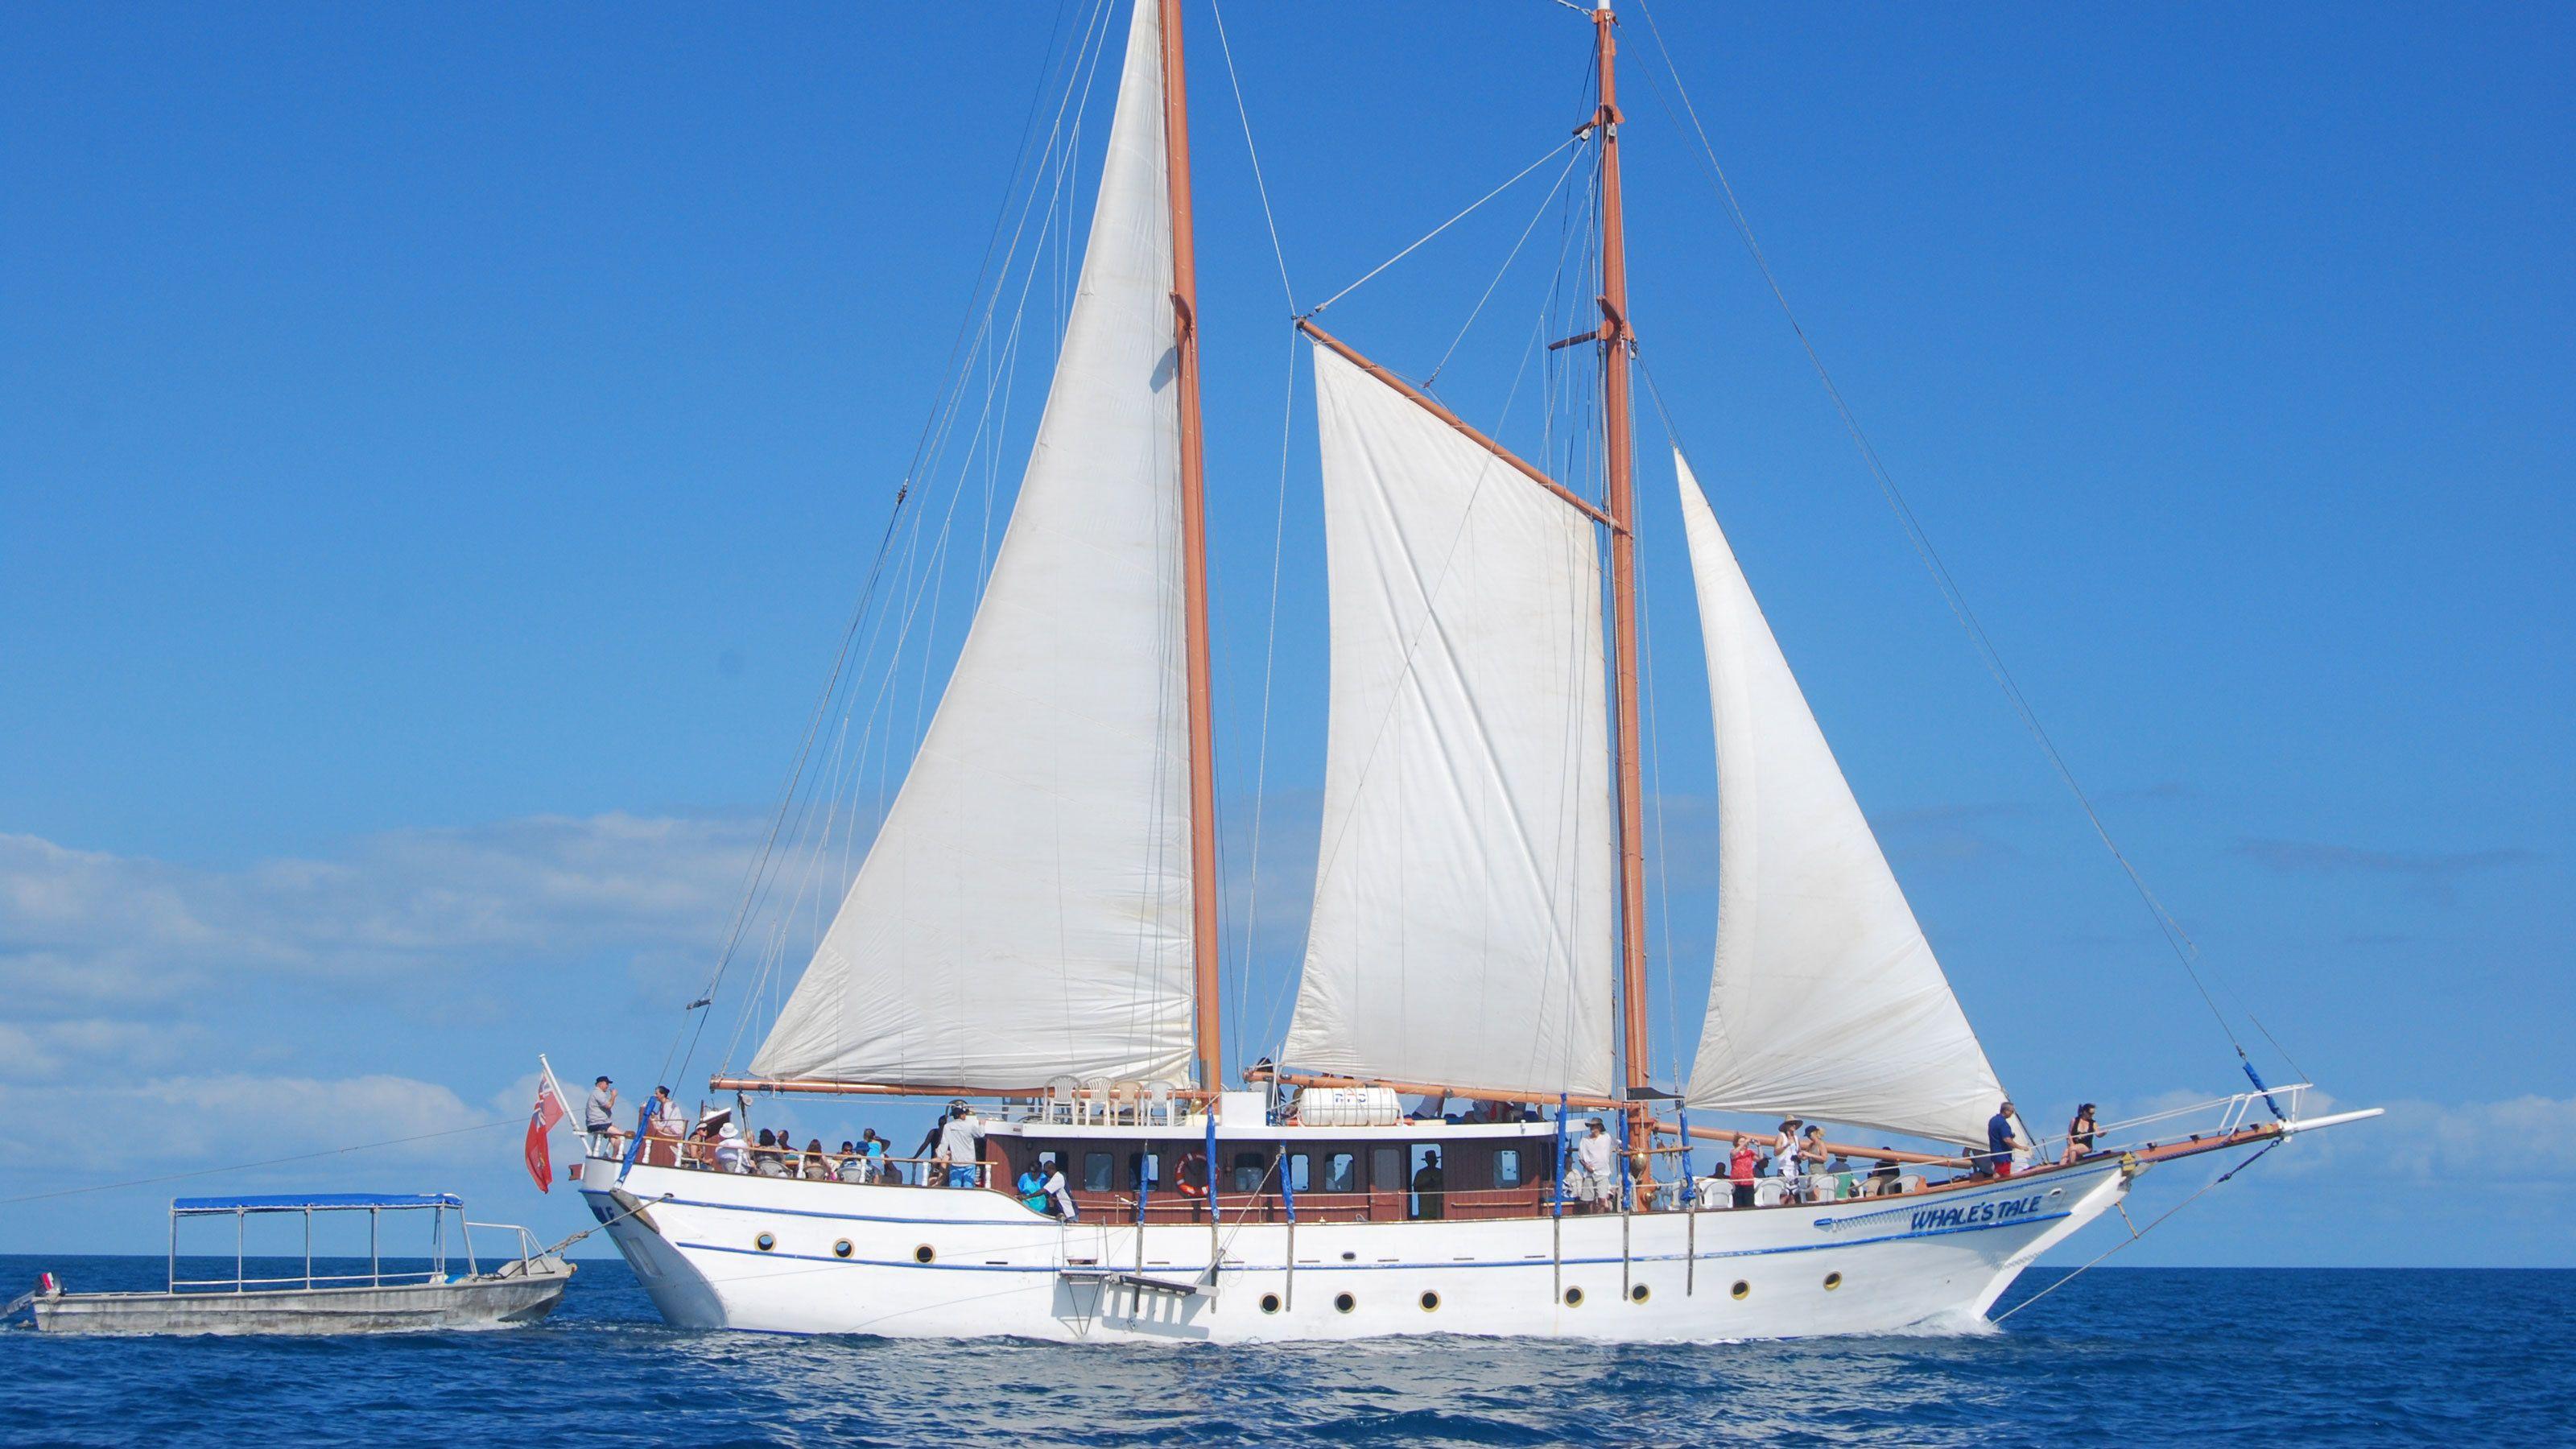 aboard a sail boat in Fiji